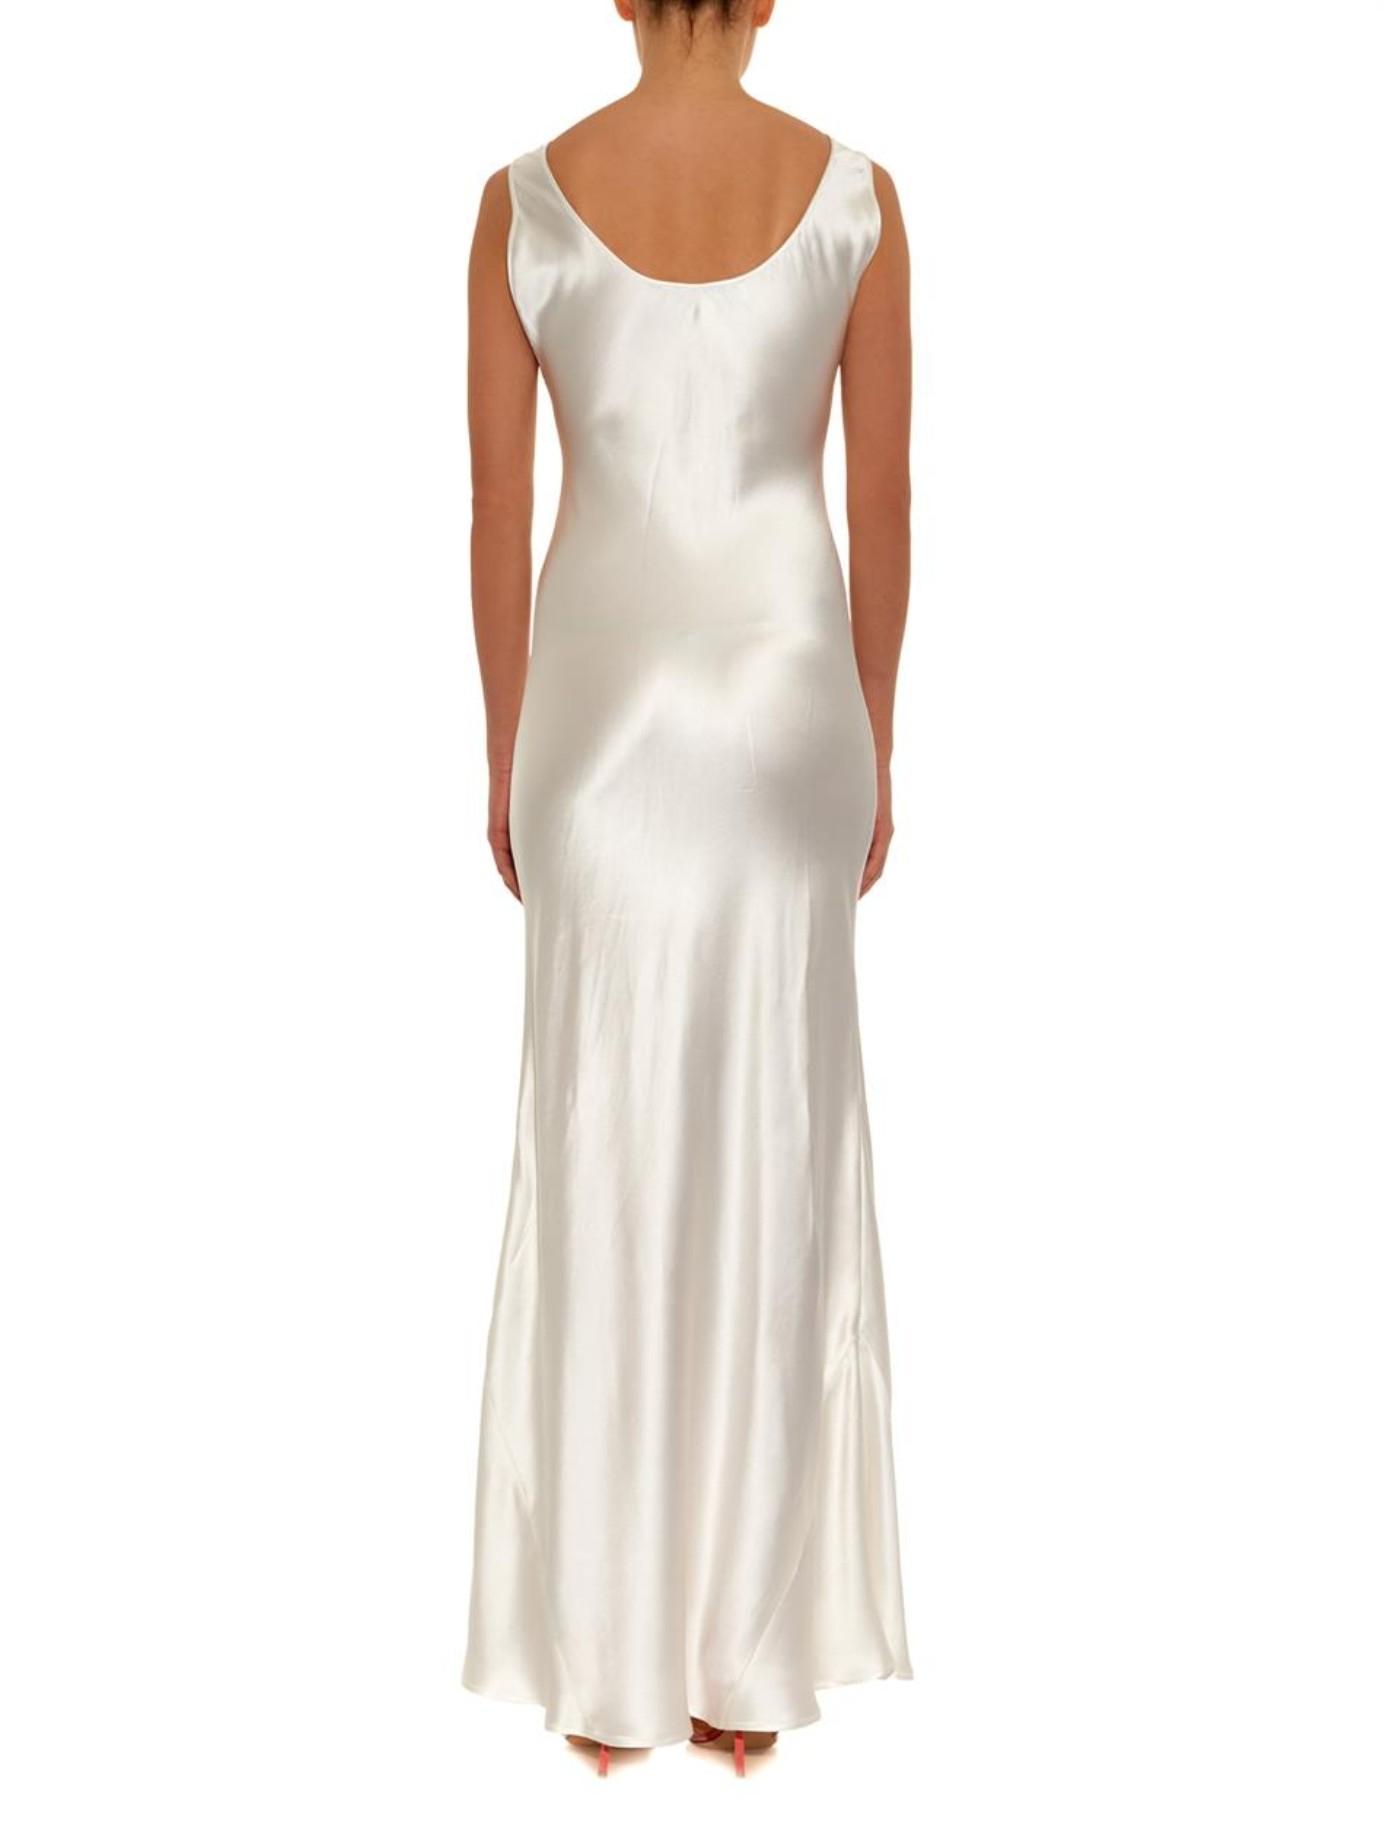 Lyst - Galvan London Silk Bias-Cut Gown in White